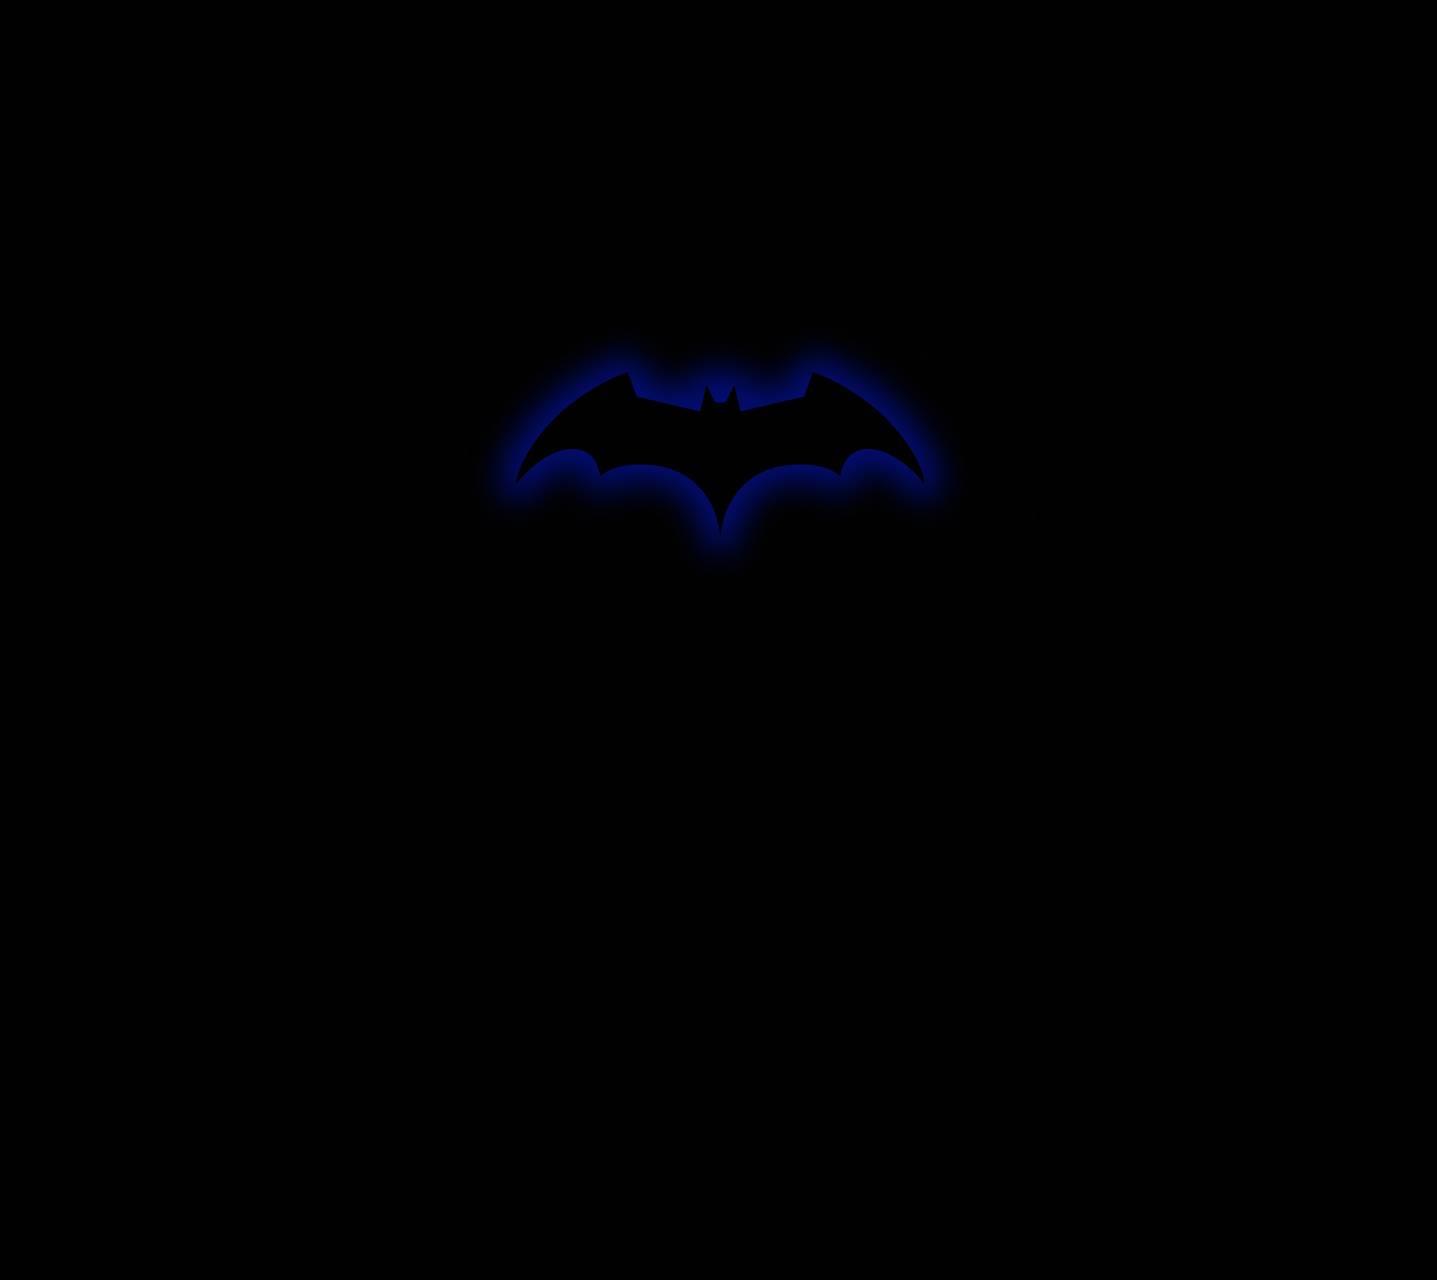 Batman Begins Wallpaper By Wwilliams42212 E6 Free On Zedge